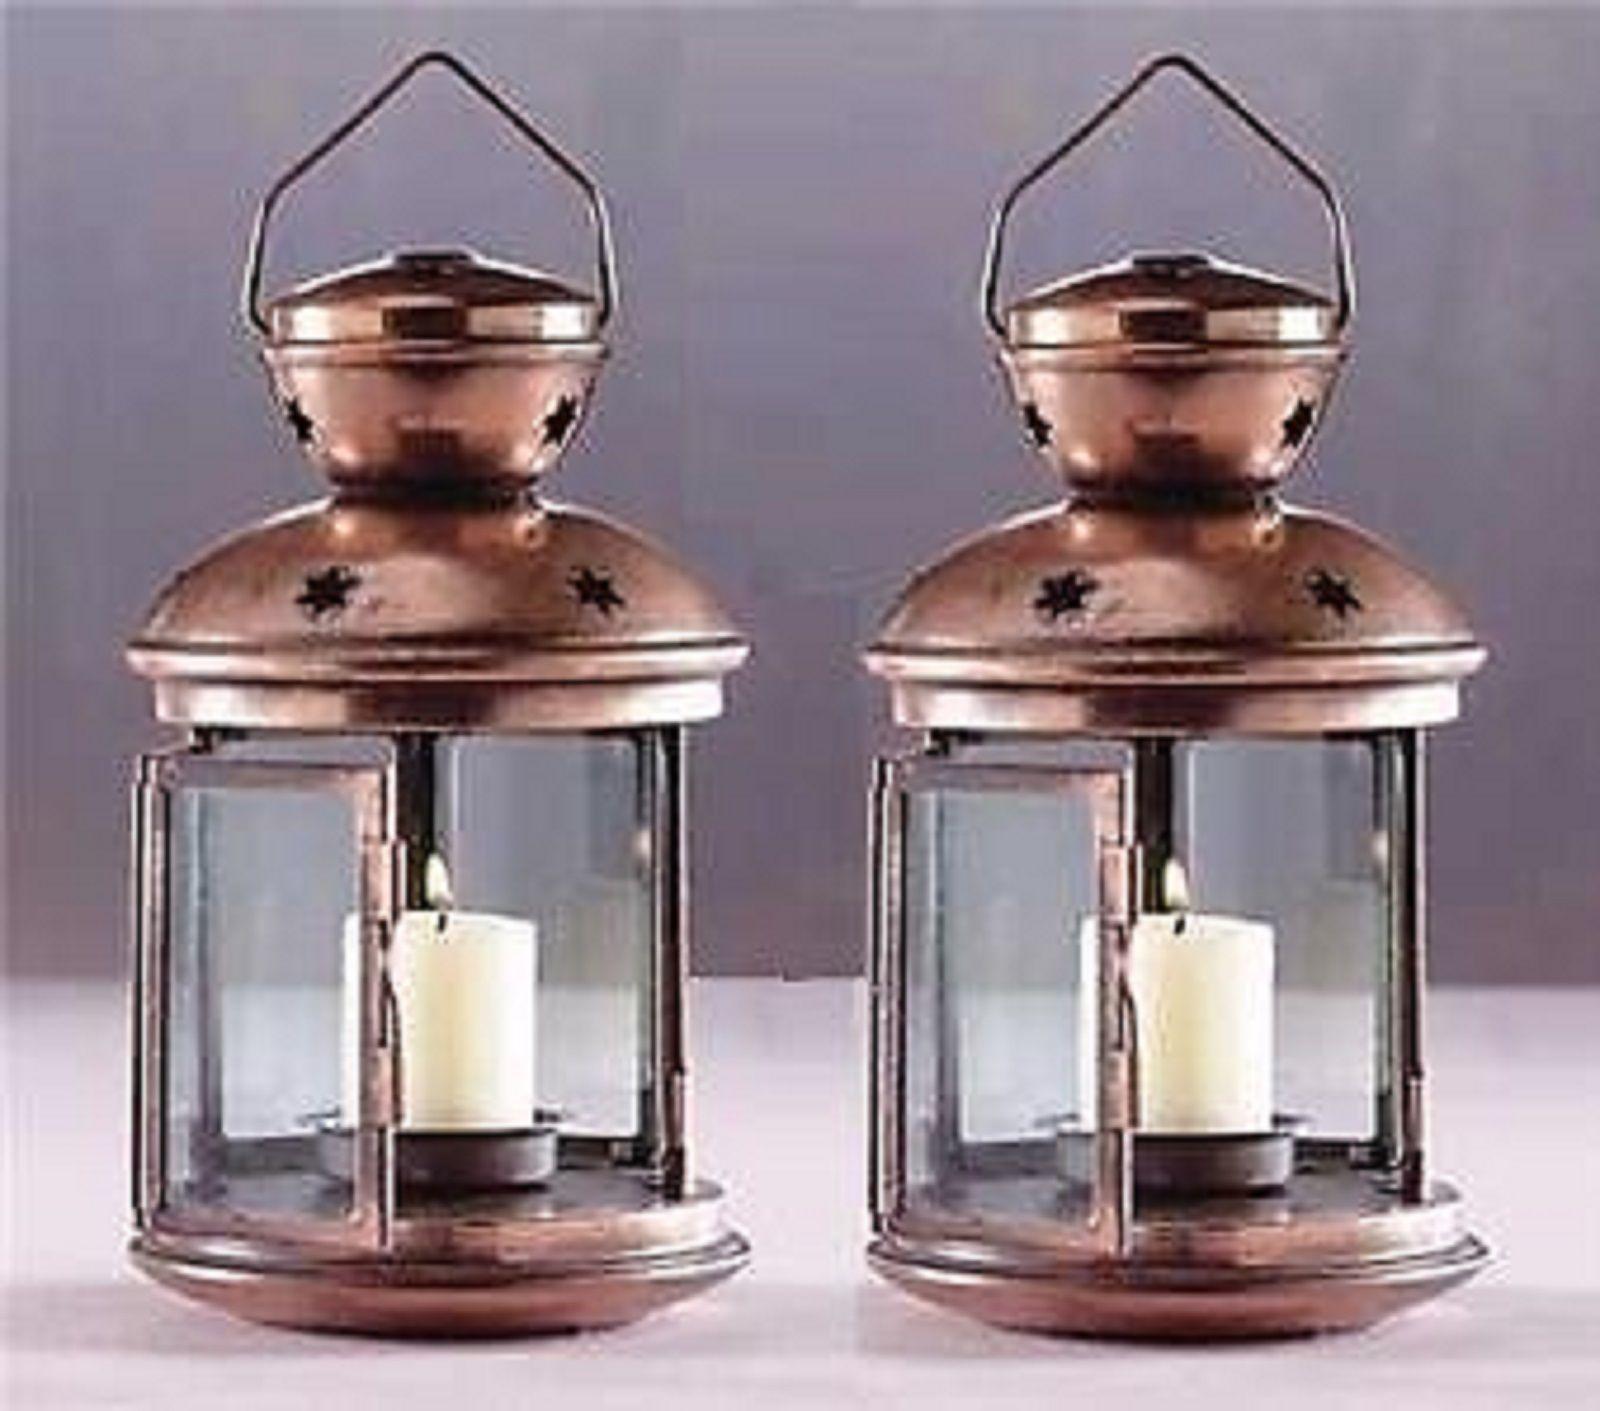 6 Star Lantern Copper Tone Candleholder Wedding Centerpieces - New